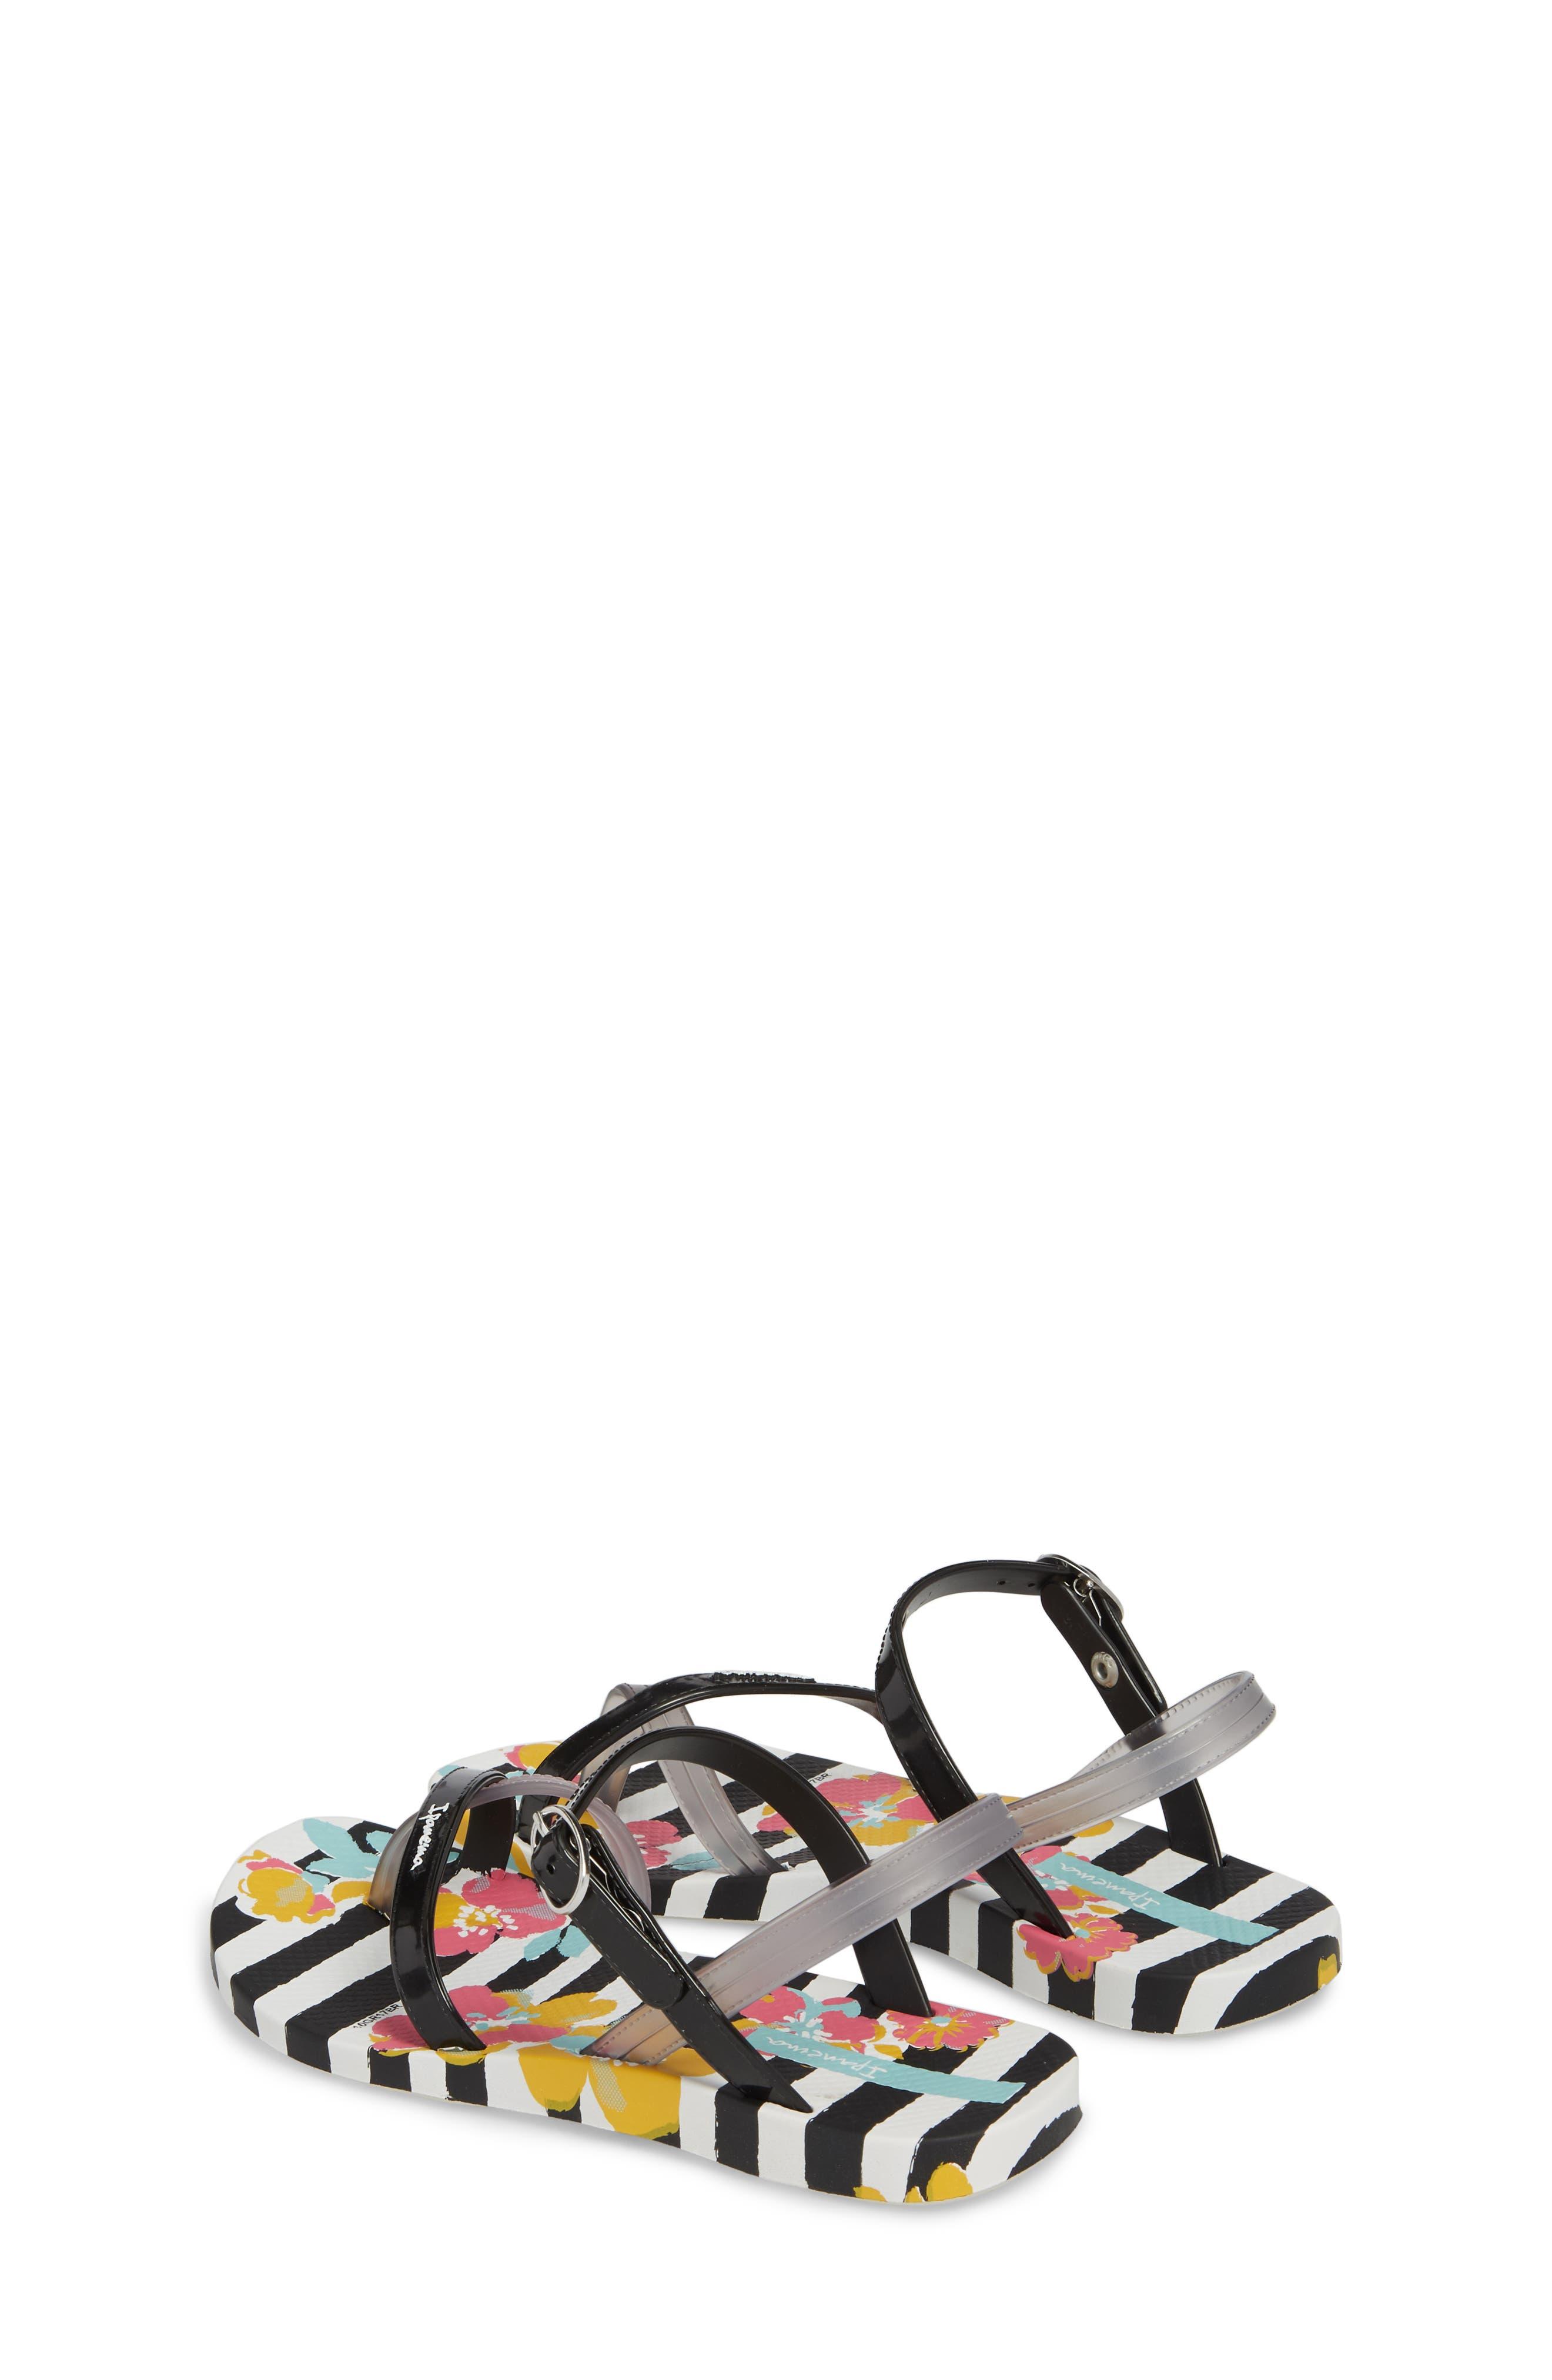 Toe Loop Sandal,                             Alternate thumbnail 2, color,                             White/ Black